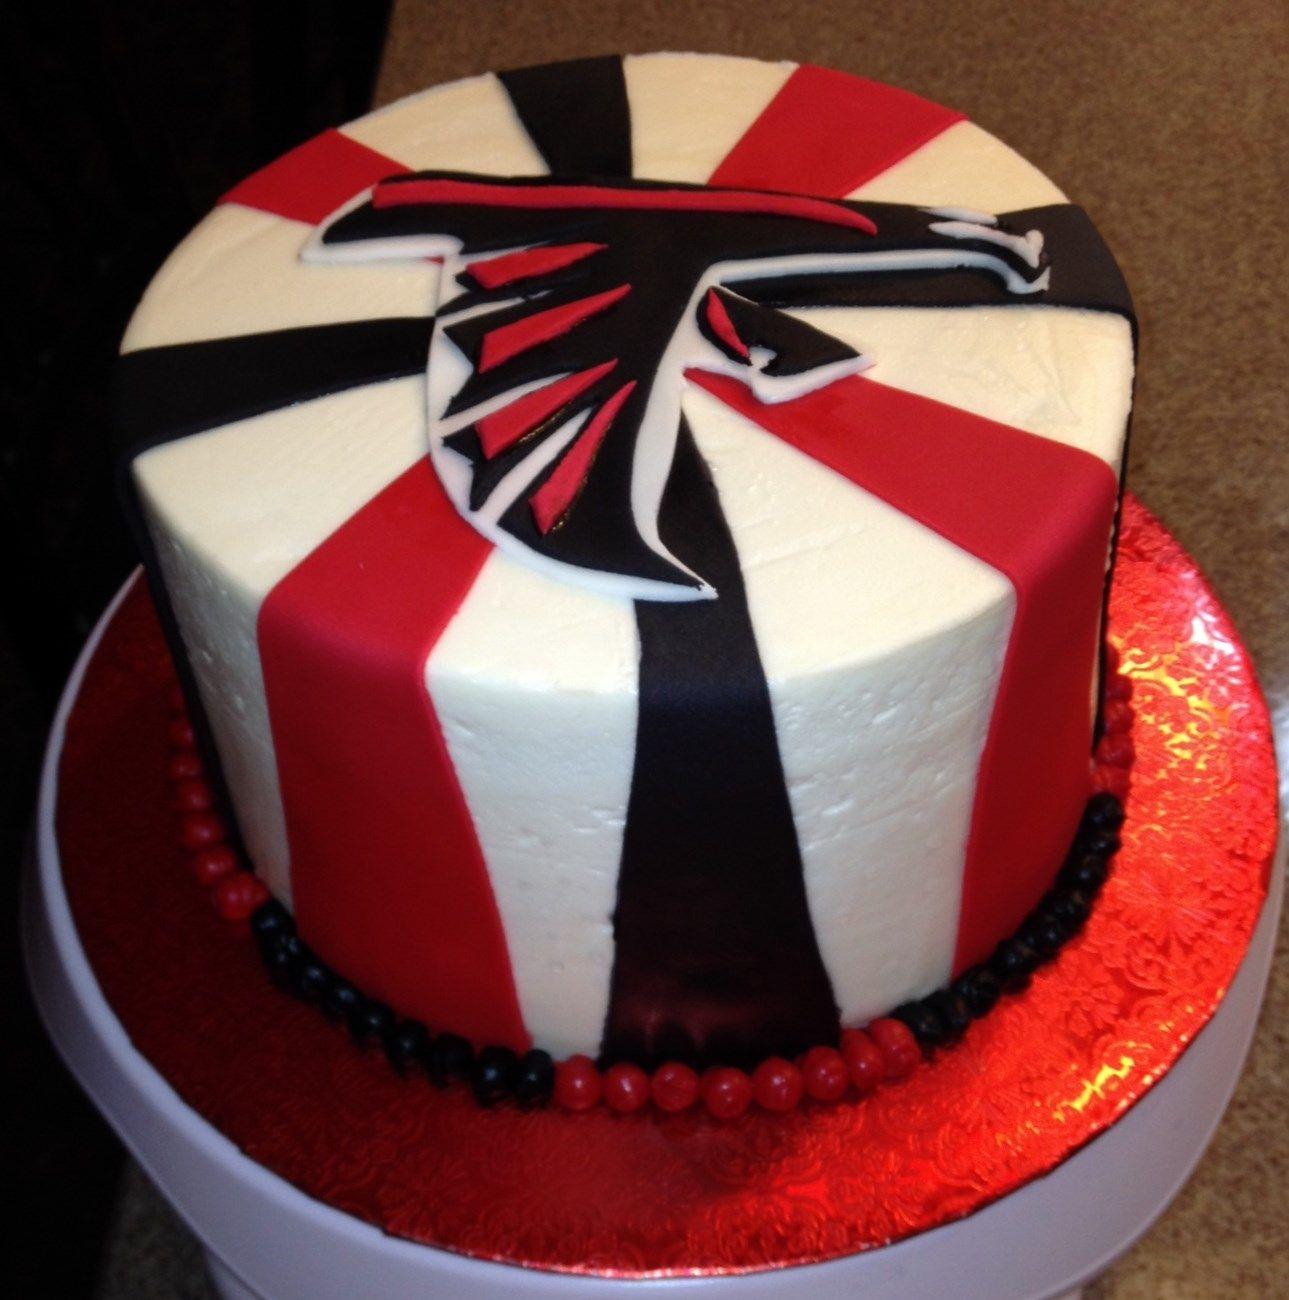 Falcons Birthday Cake Cake Birthday Cake How To Make Cake